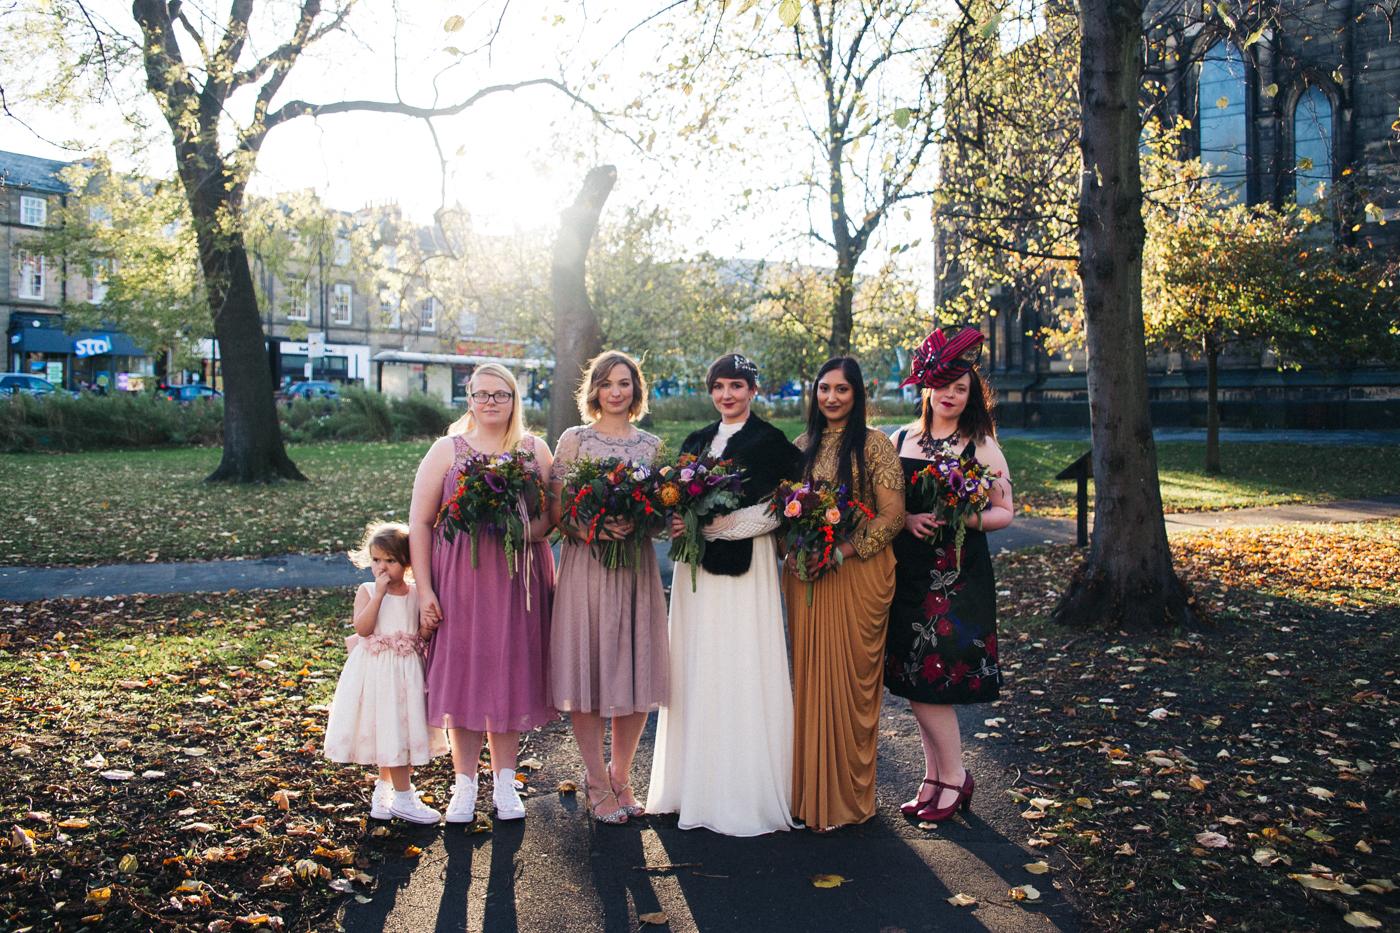 teesside-newcastle-gateshead-wedding-photography-photographer-creative-0042.jpg